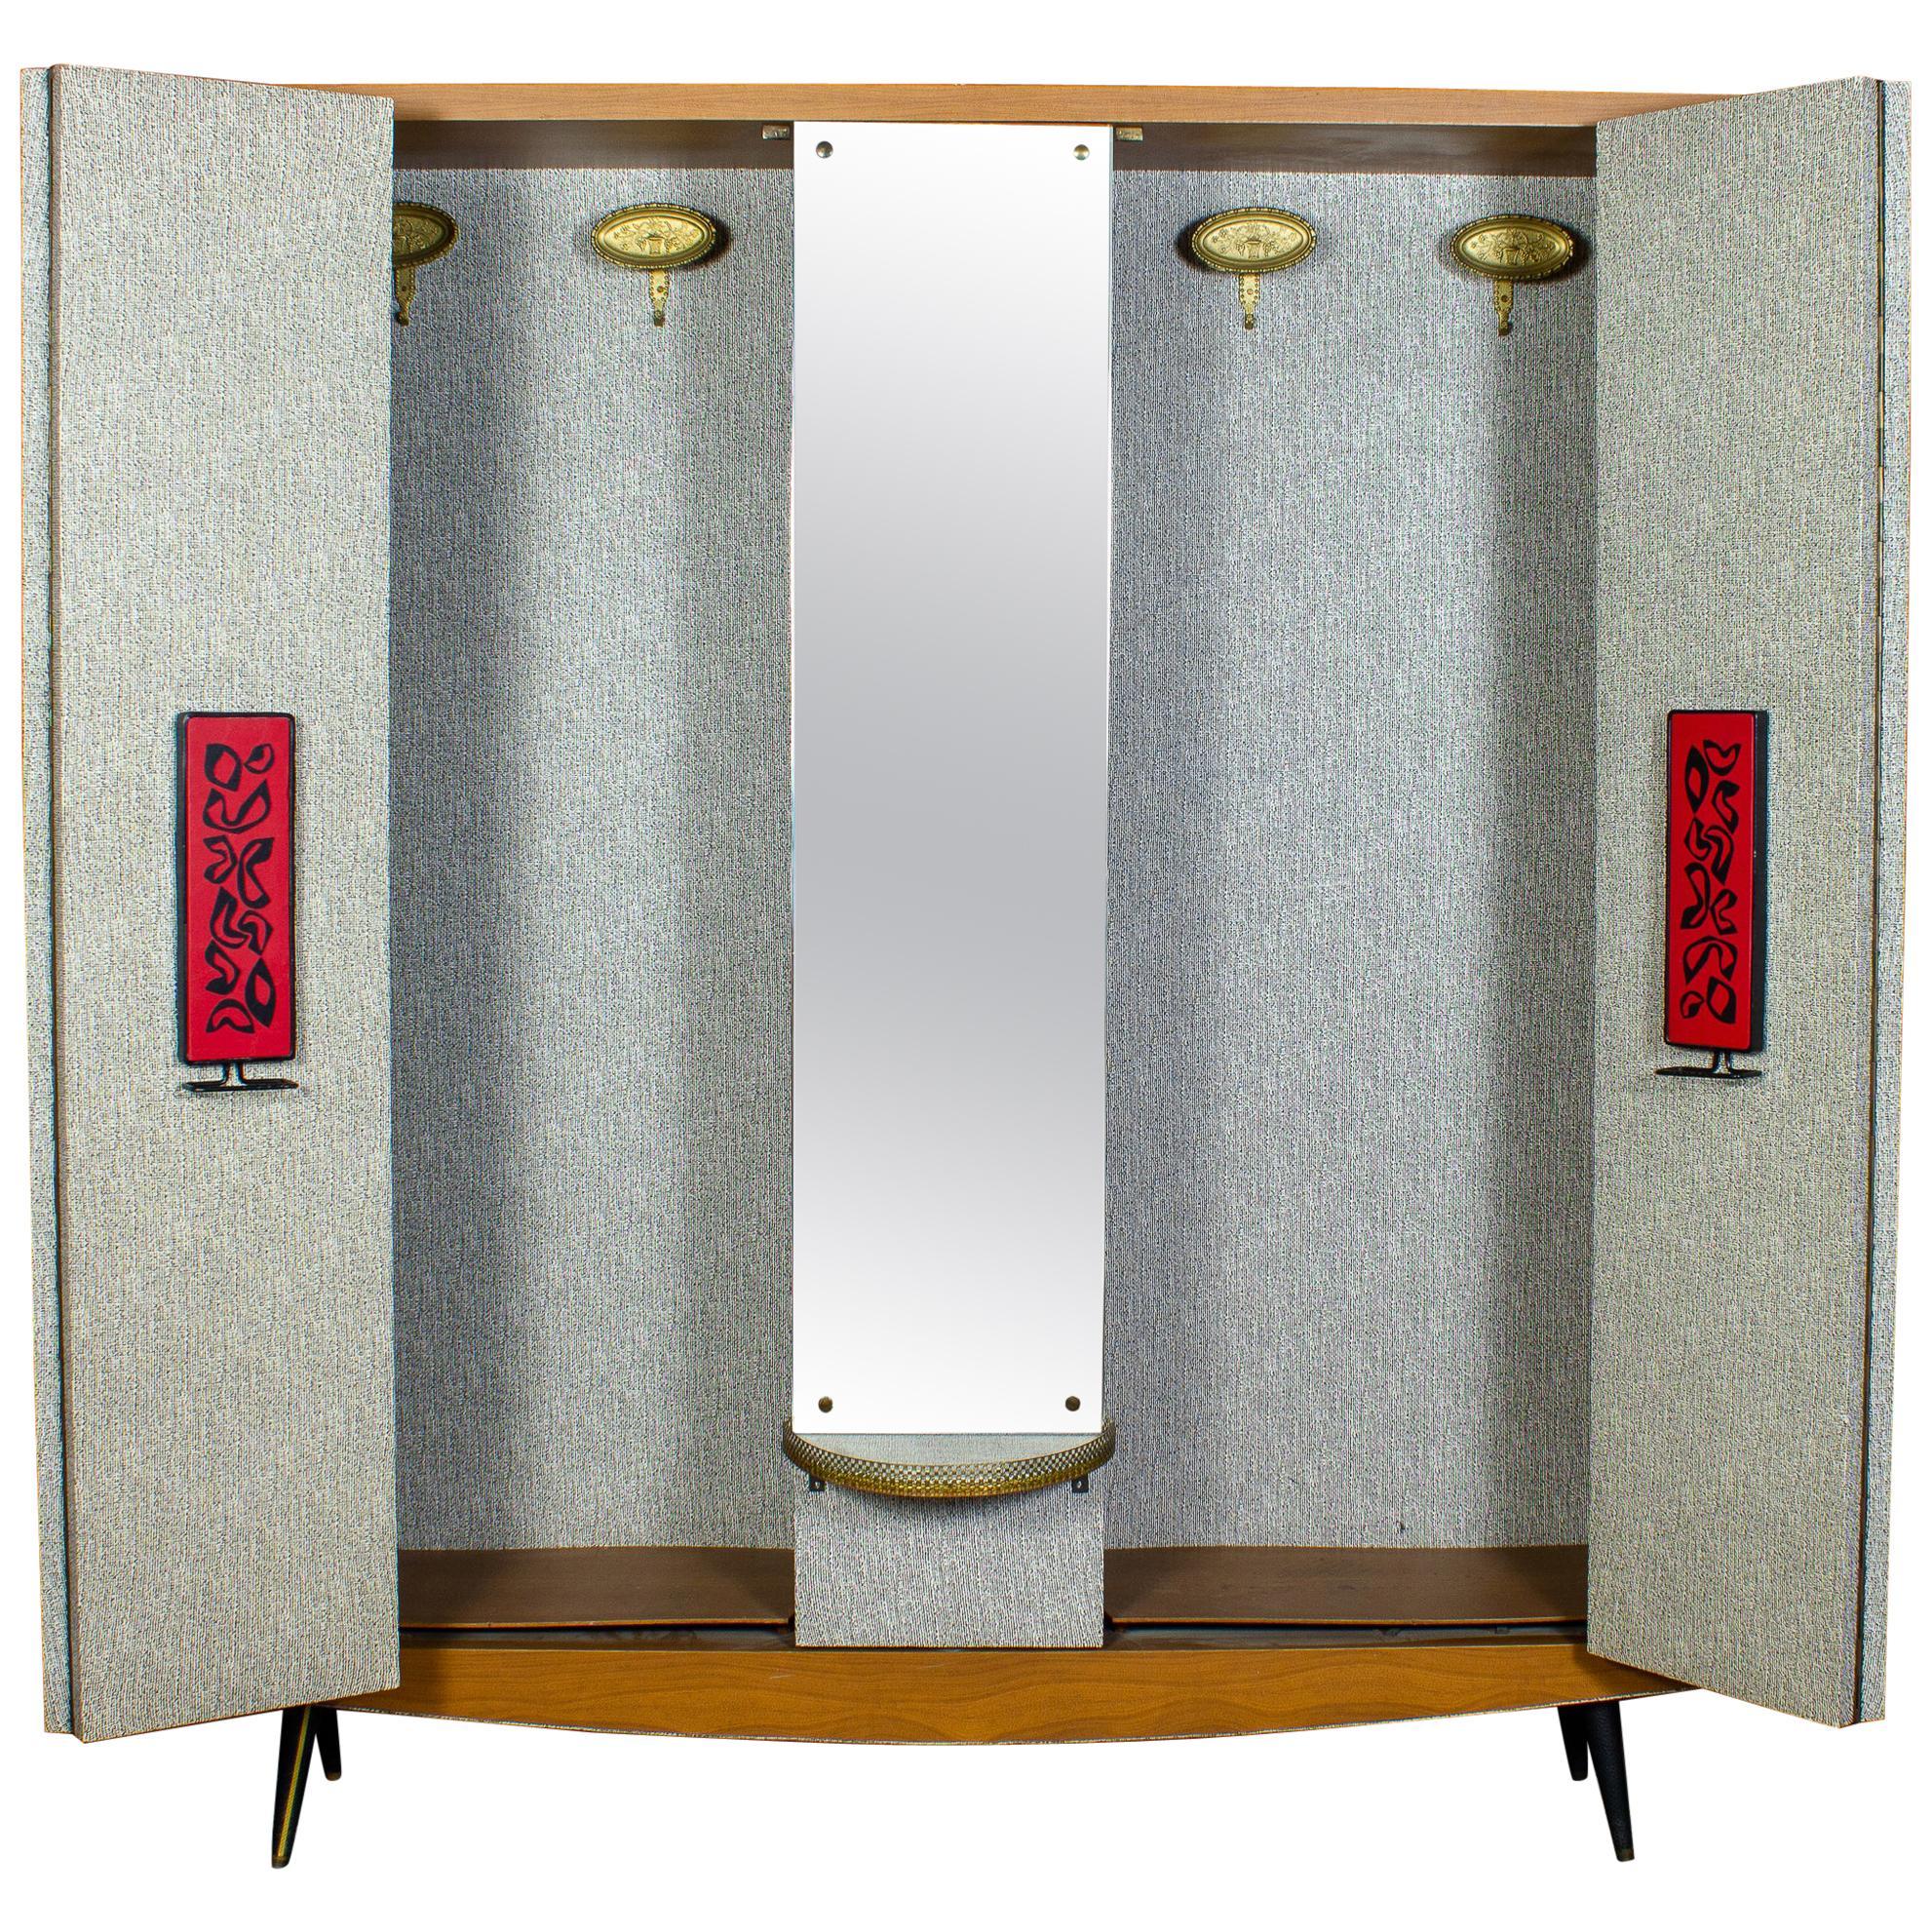 Midcentury Italian Entrance Wardrobe with Mirror by Umberto Mascagni